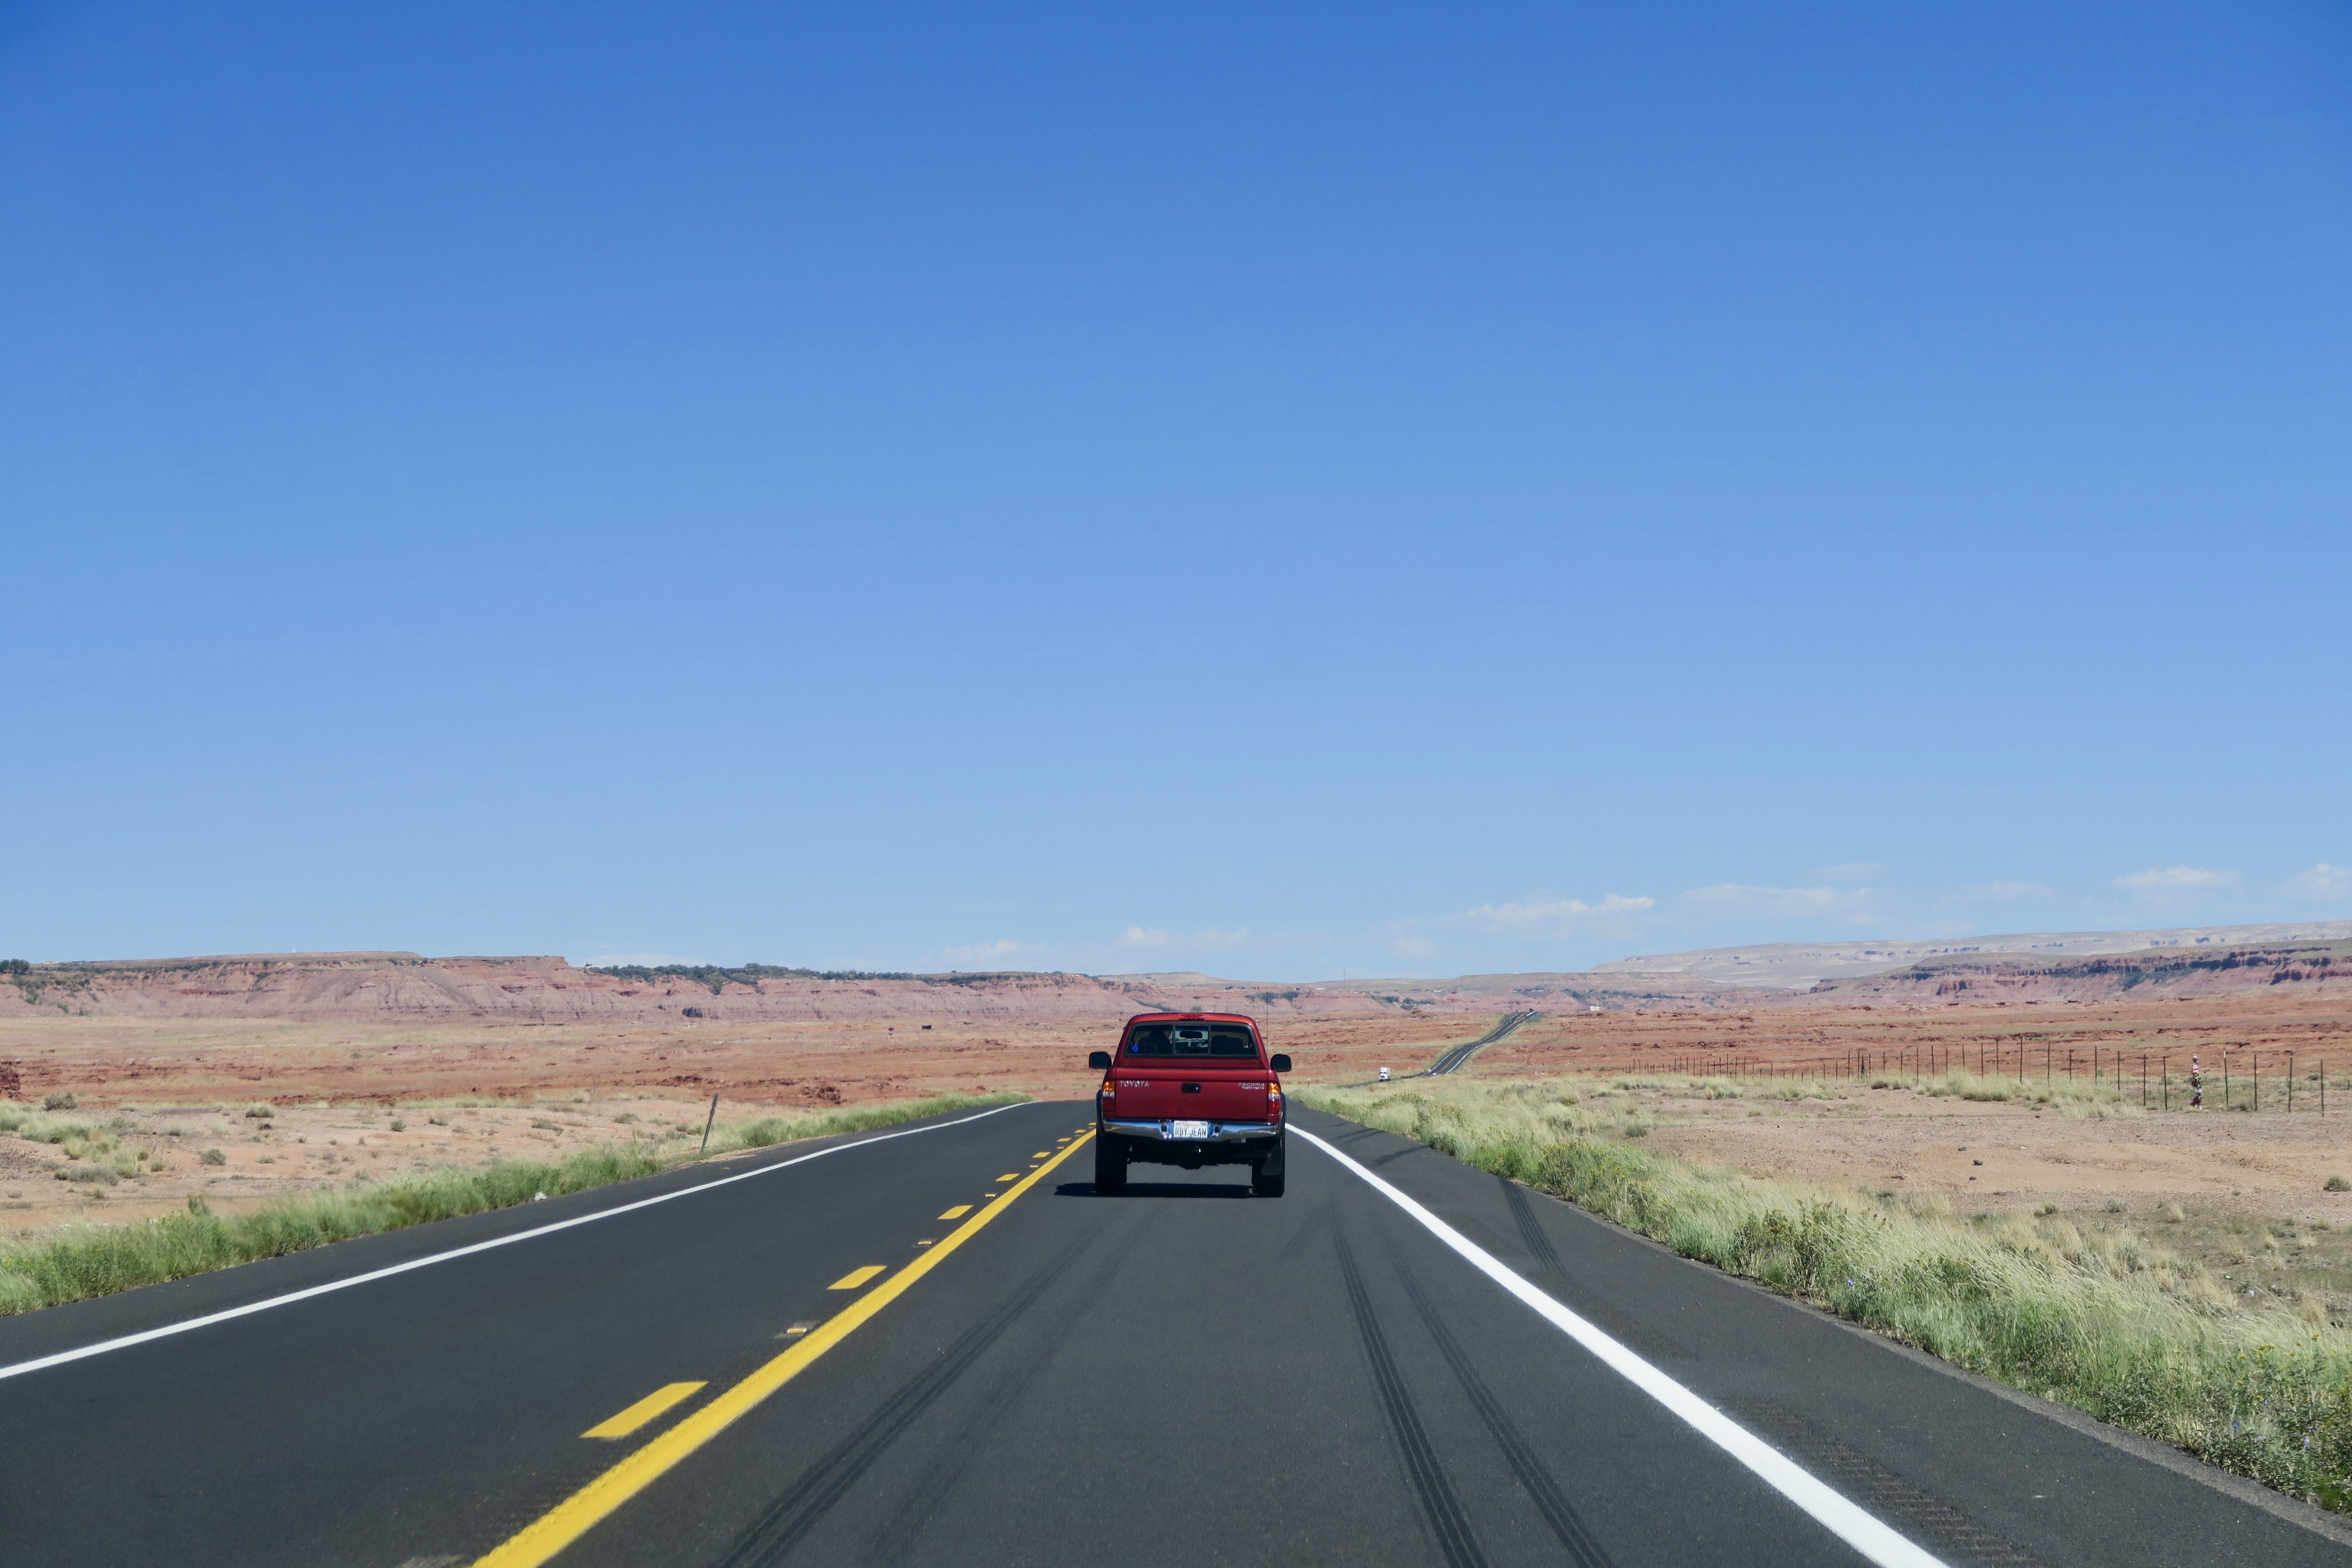 road_trip_ouest_americain